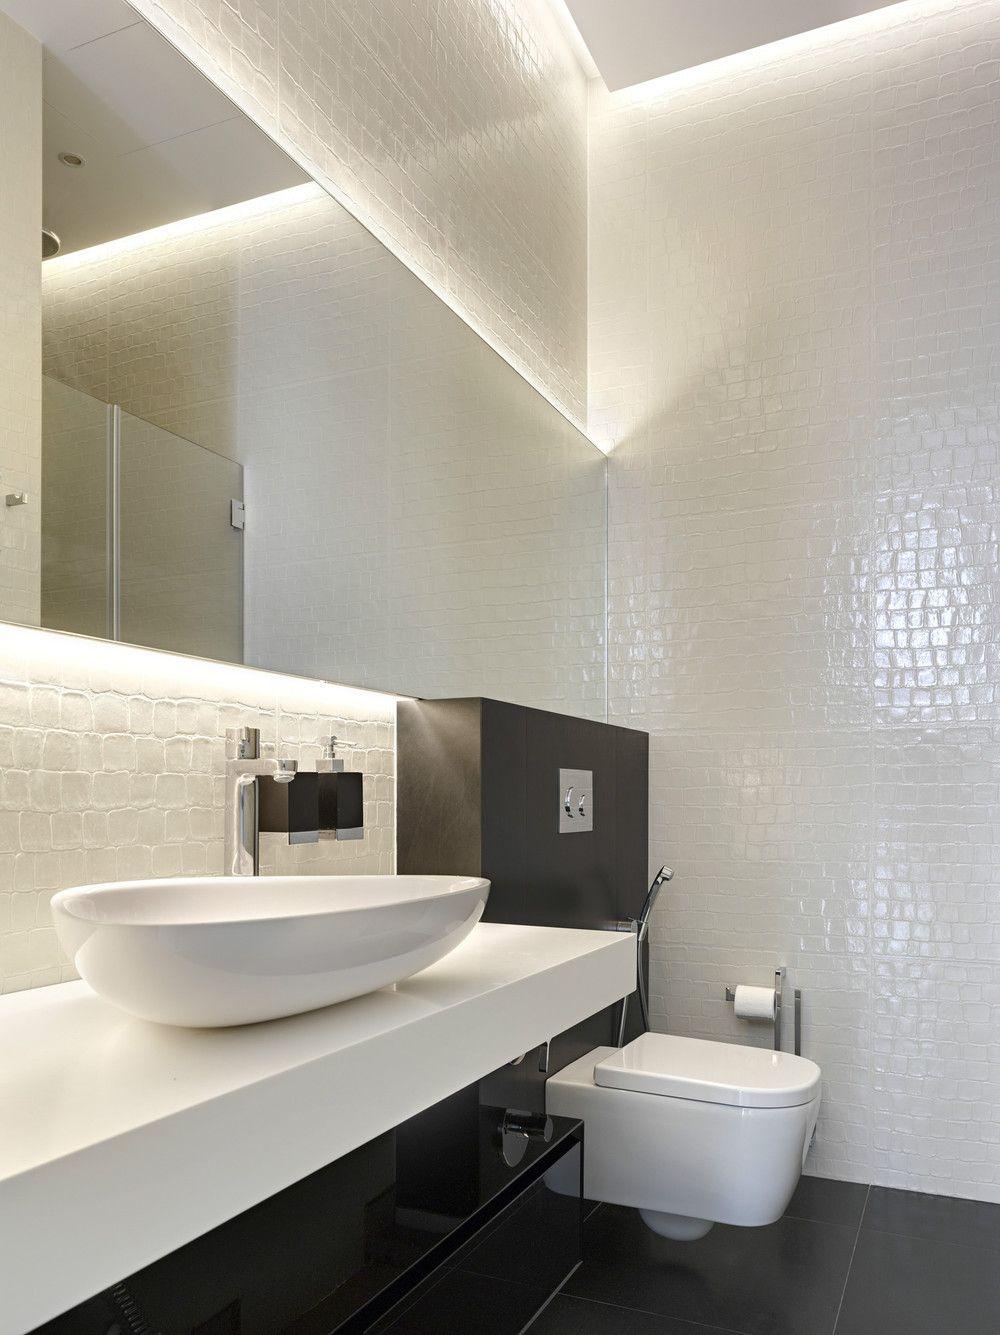 Badezimmerwanddekor über toilette pin by eva oppen solheim on bad  pinterest  bathroom modern